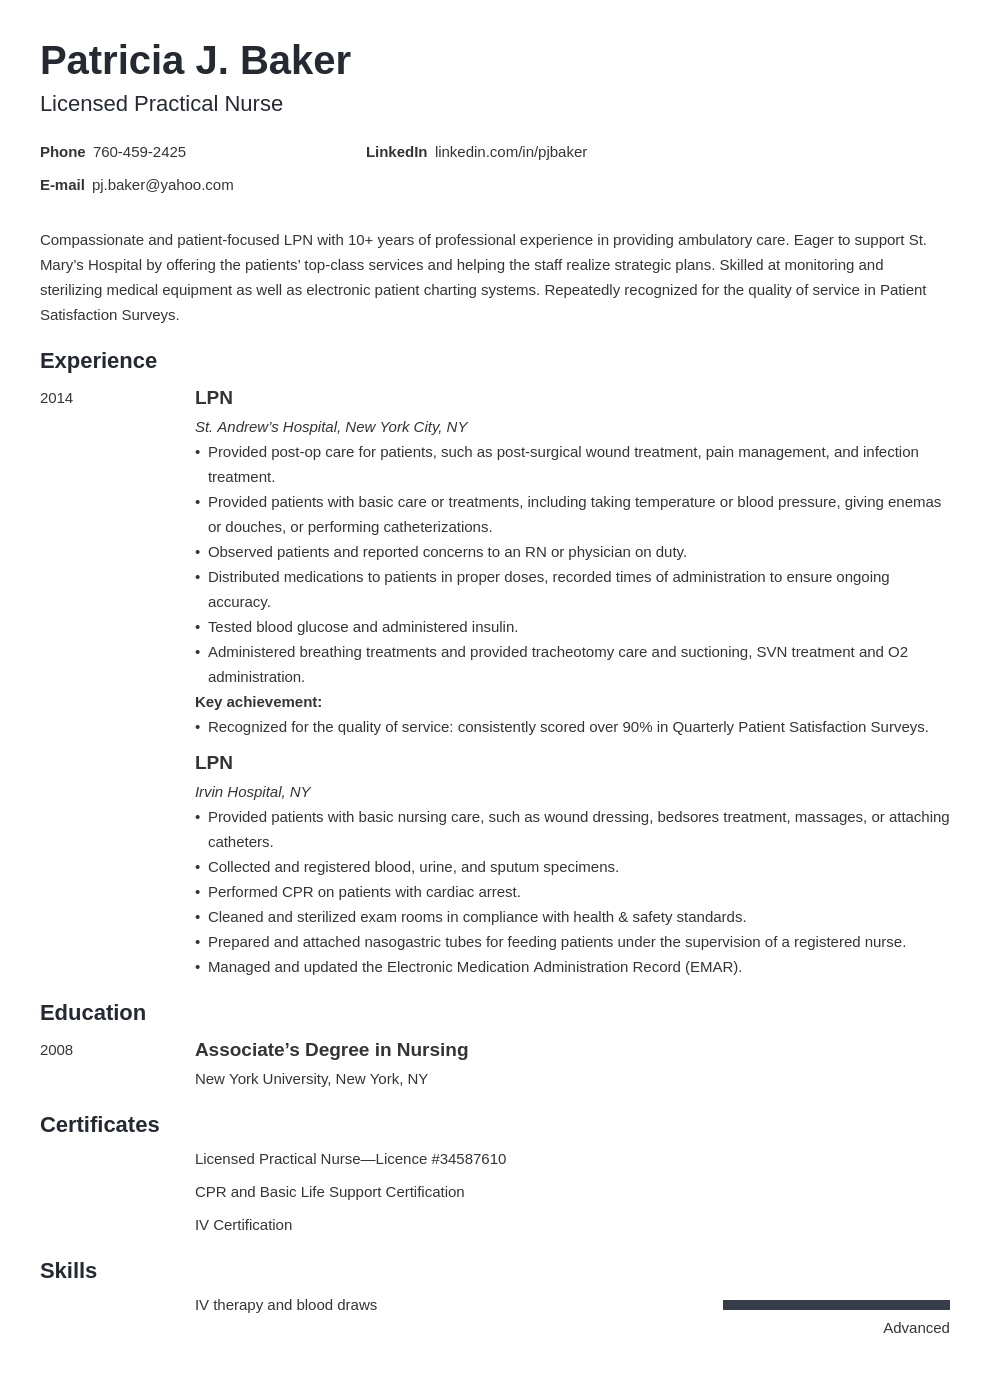 lpn resume example template minimo in 2020 Lpn resume